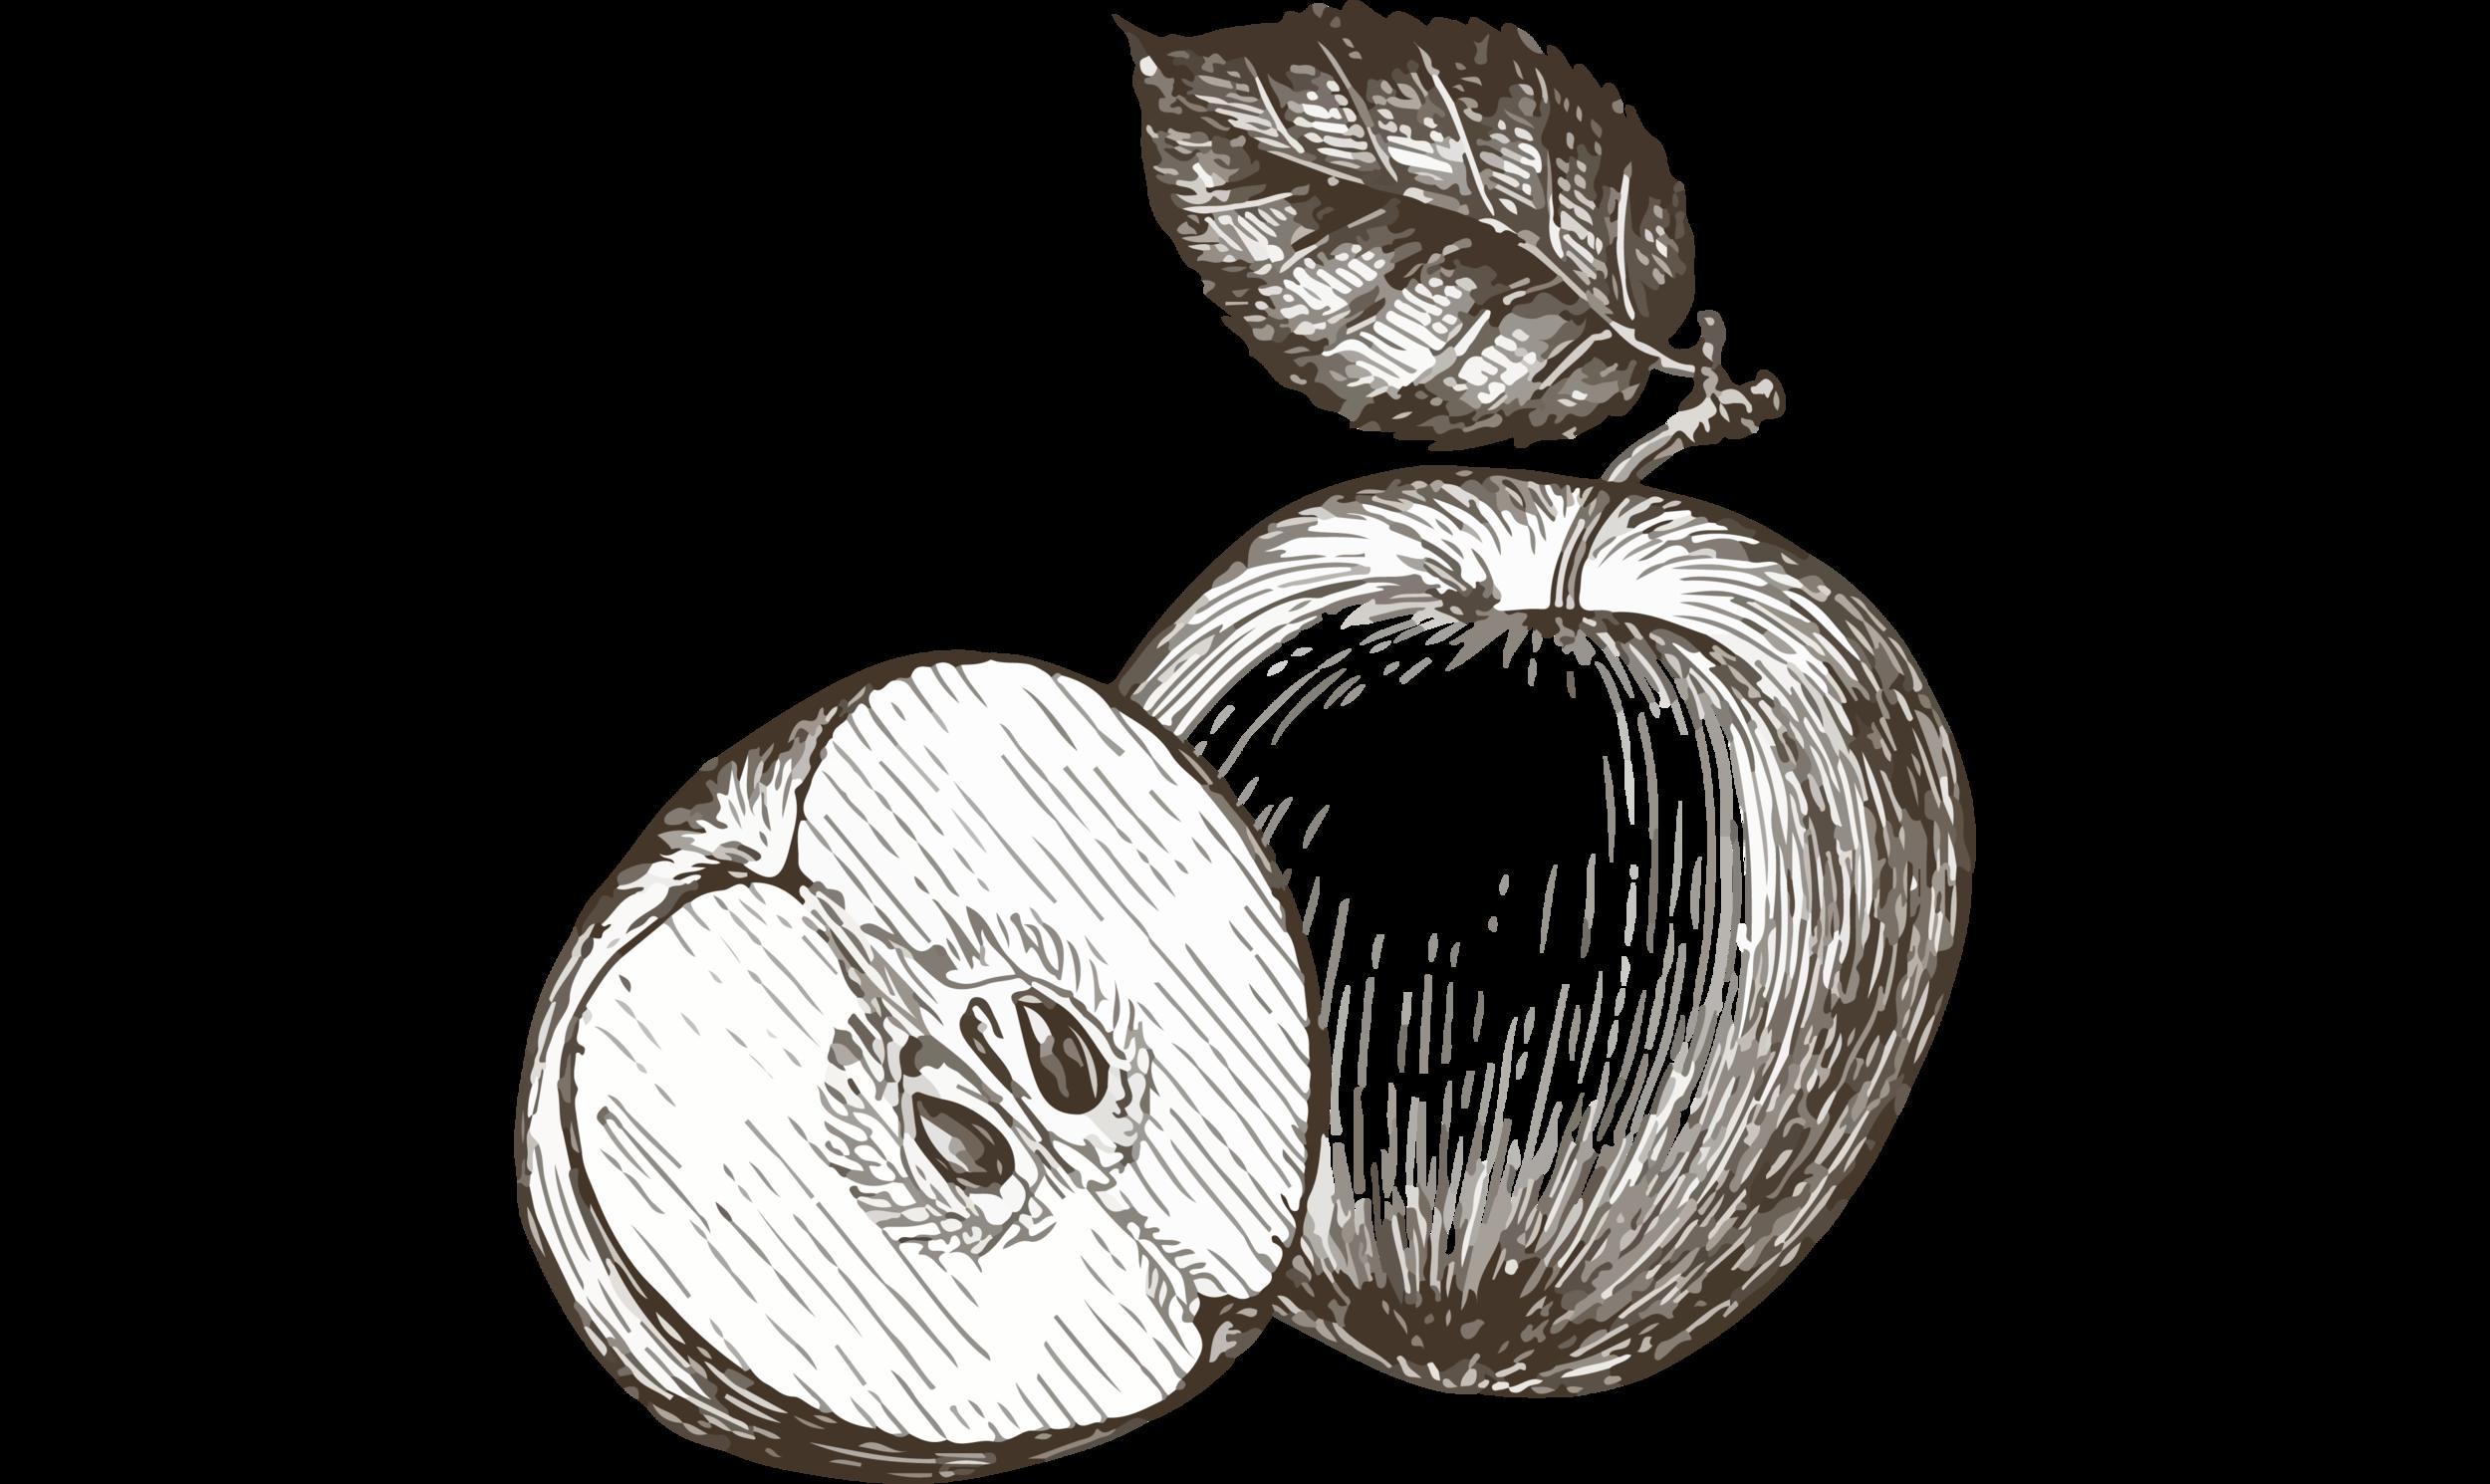 vintage apple_wide.png